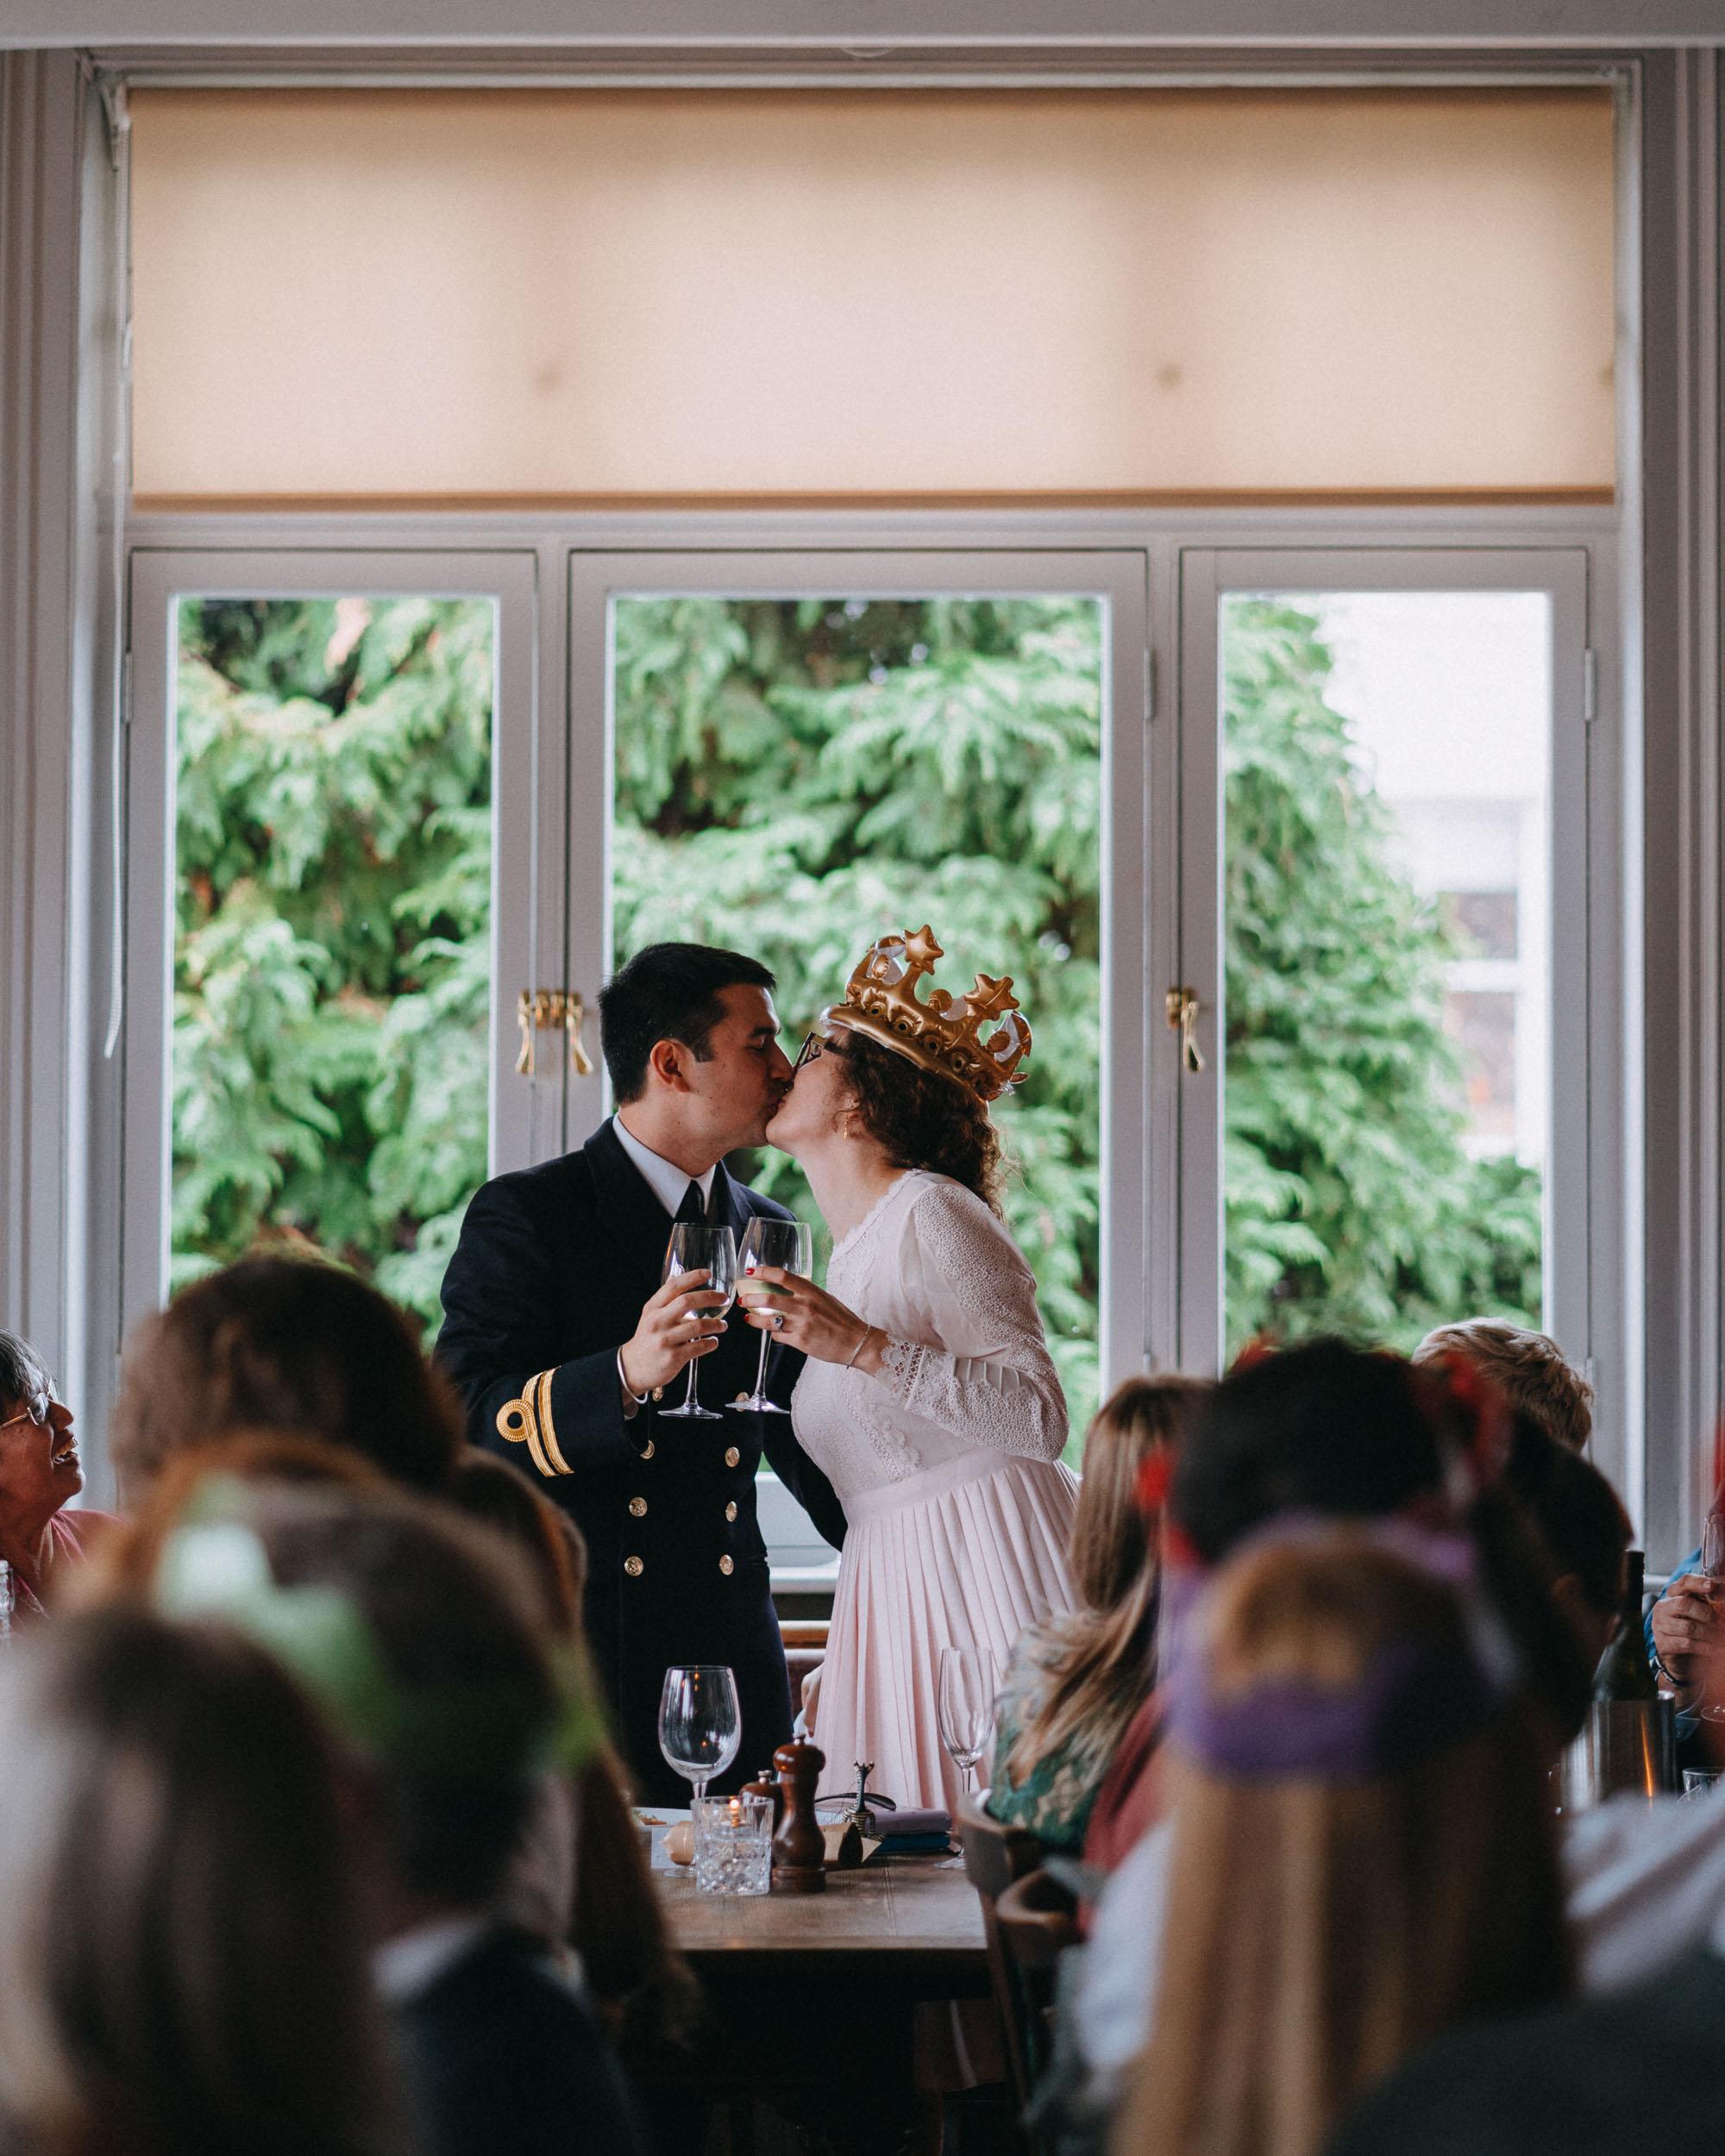 Documentary Wedding Photographer in London